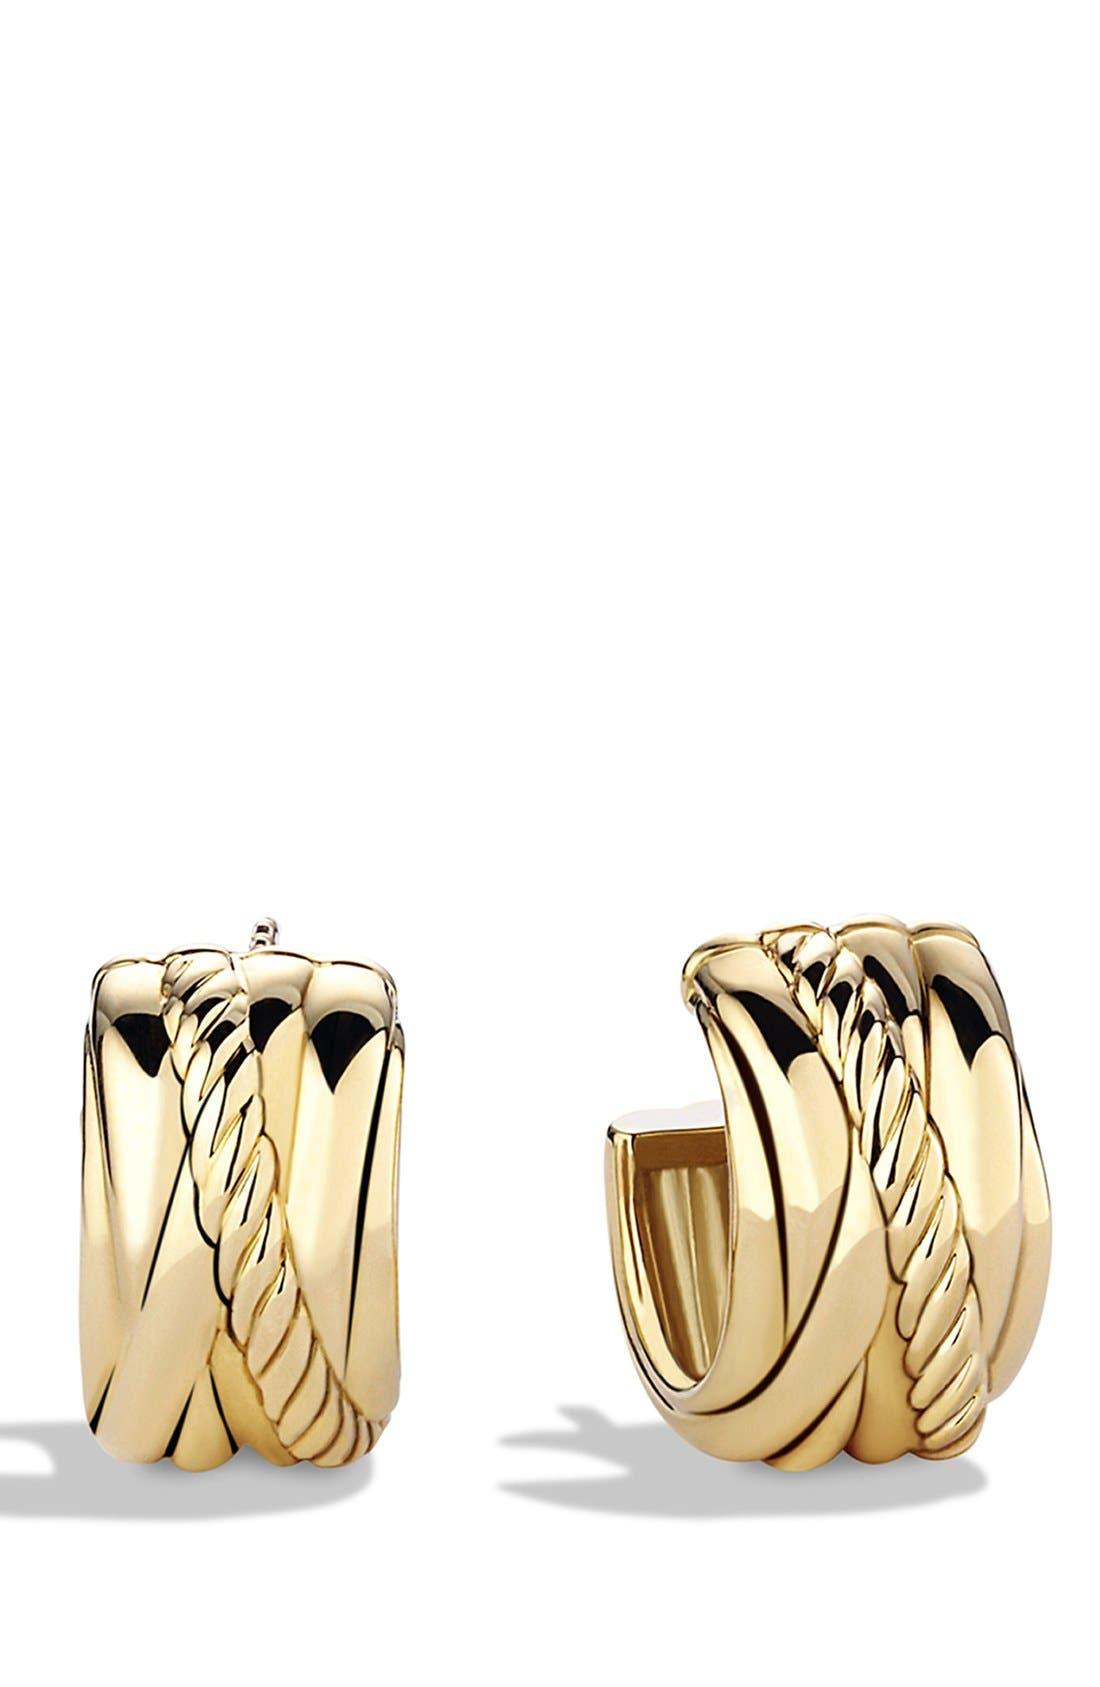 Main Image - David Yurman 'Crossover' Earrings in Gold